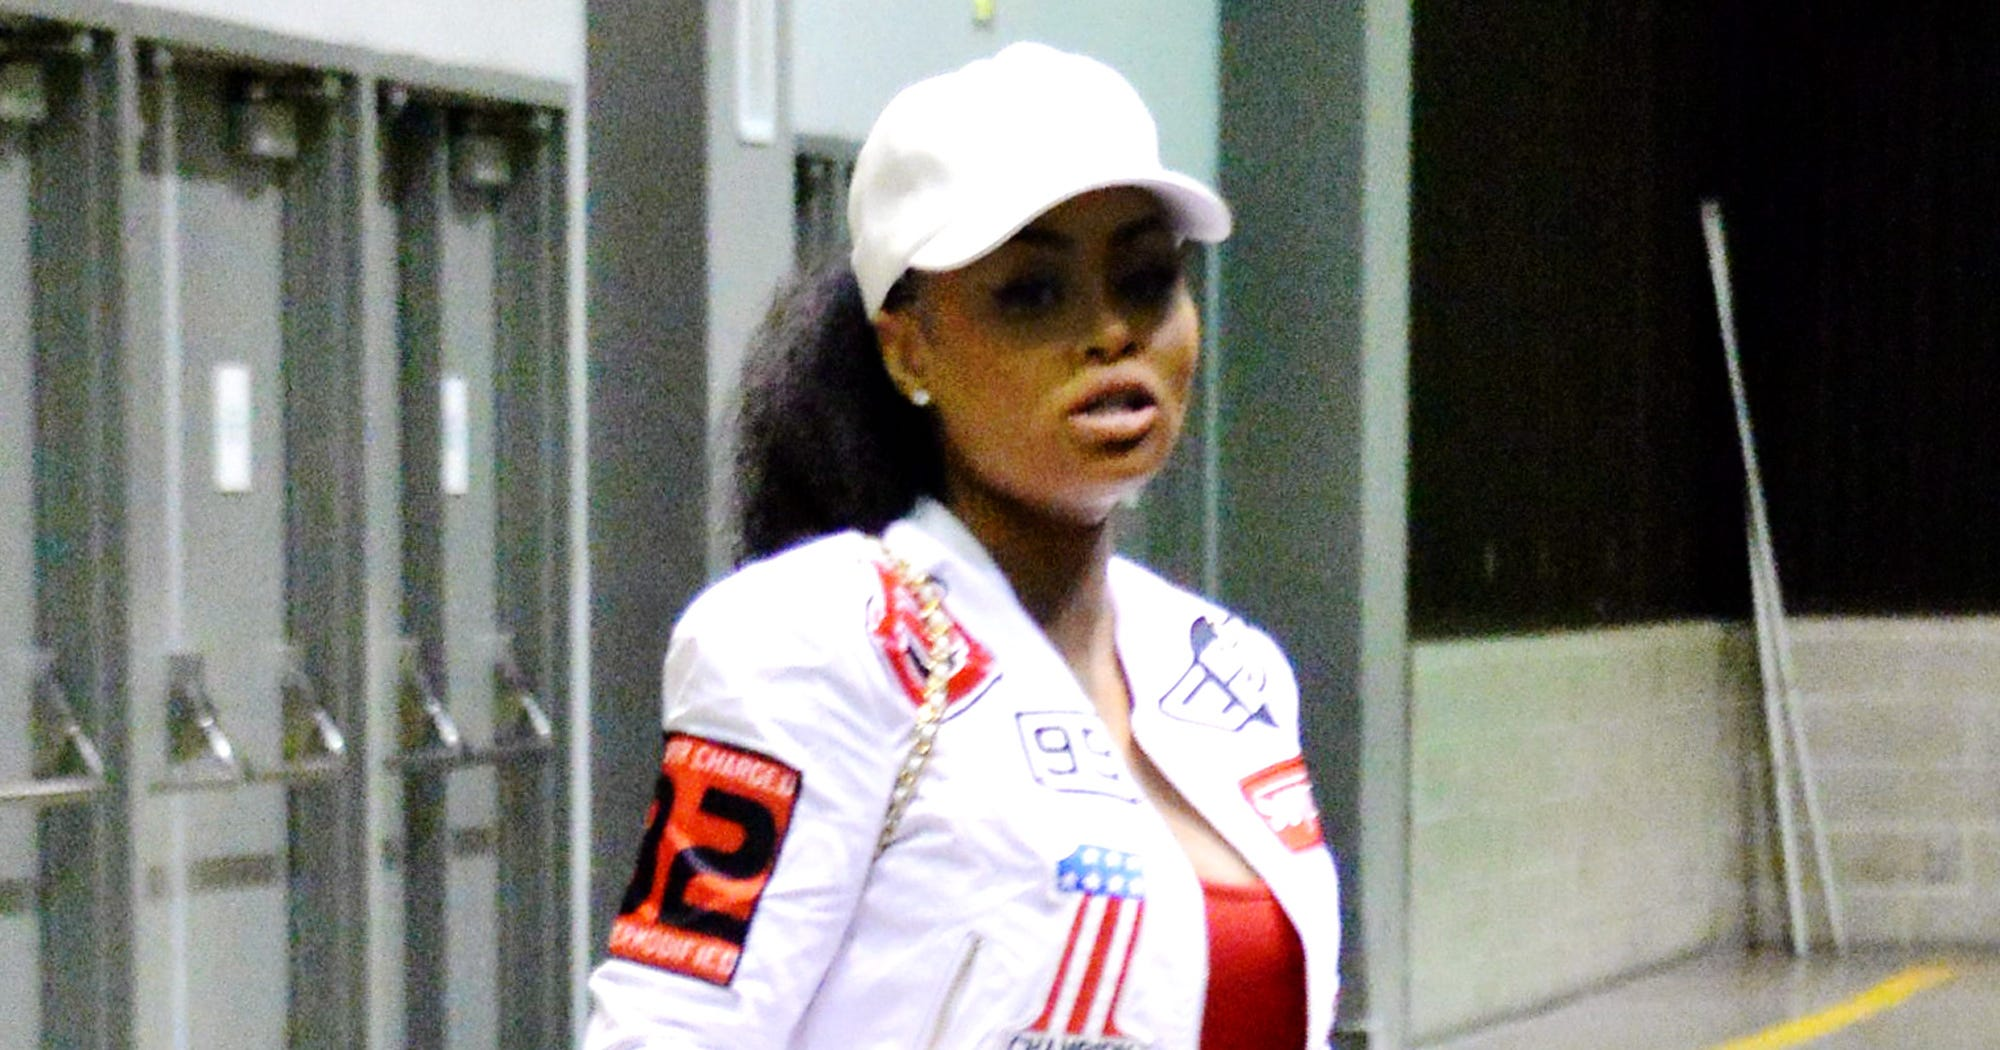 Blac Chyna Shows Off Her Baby Bump & Shades The Kardashians